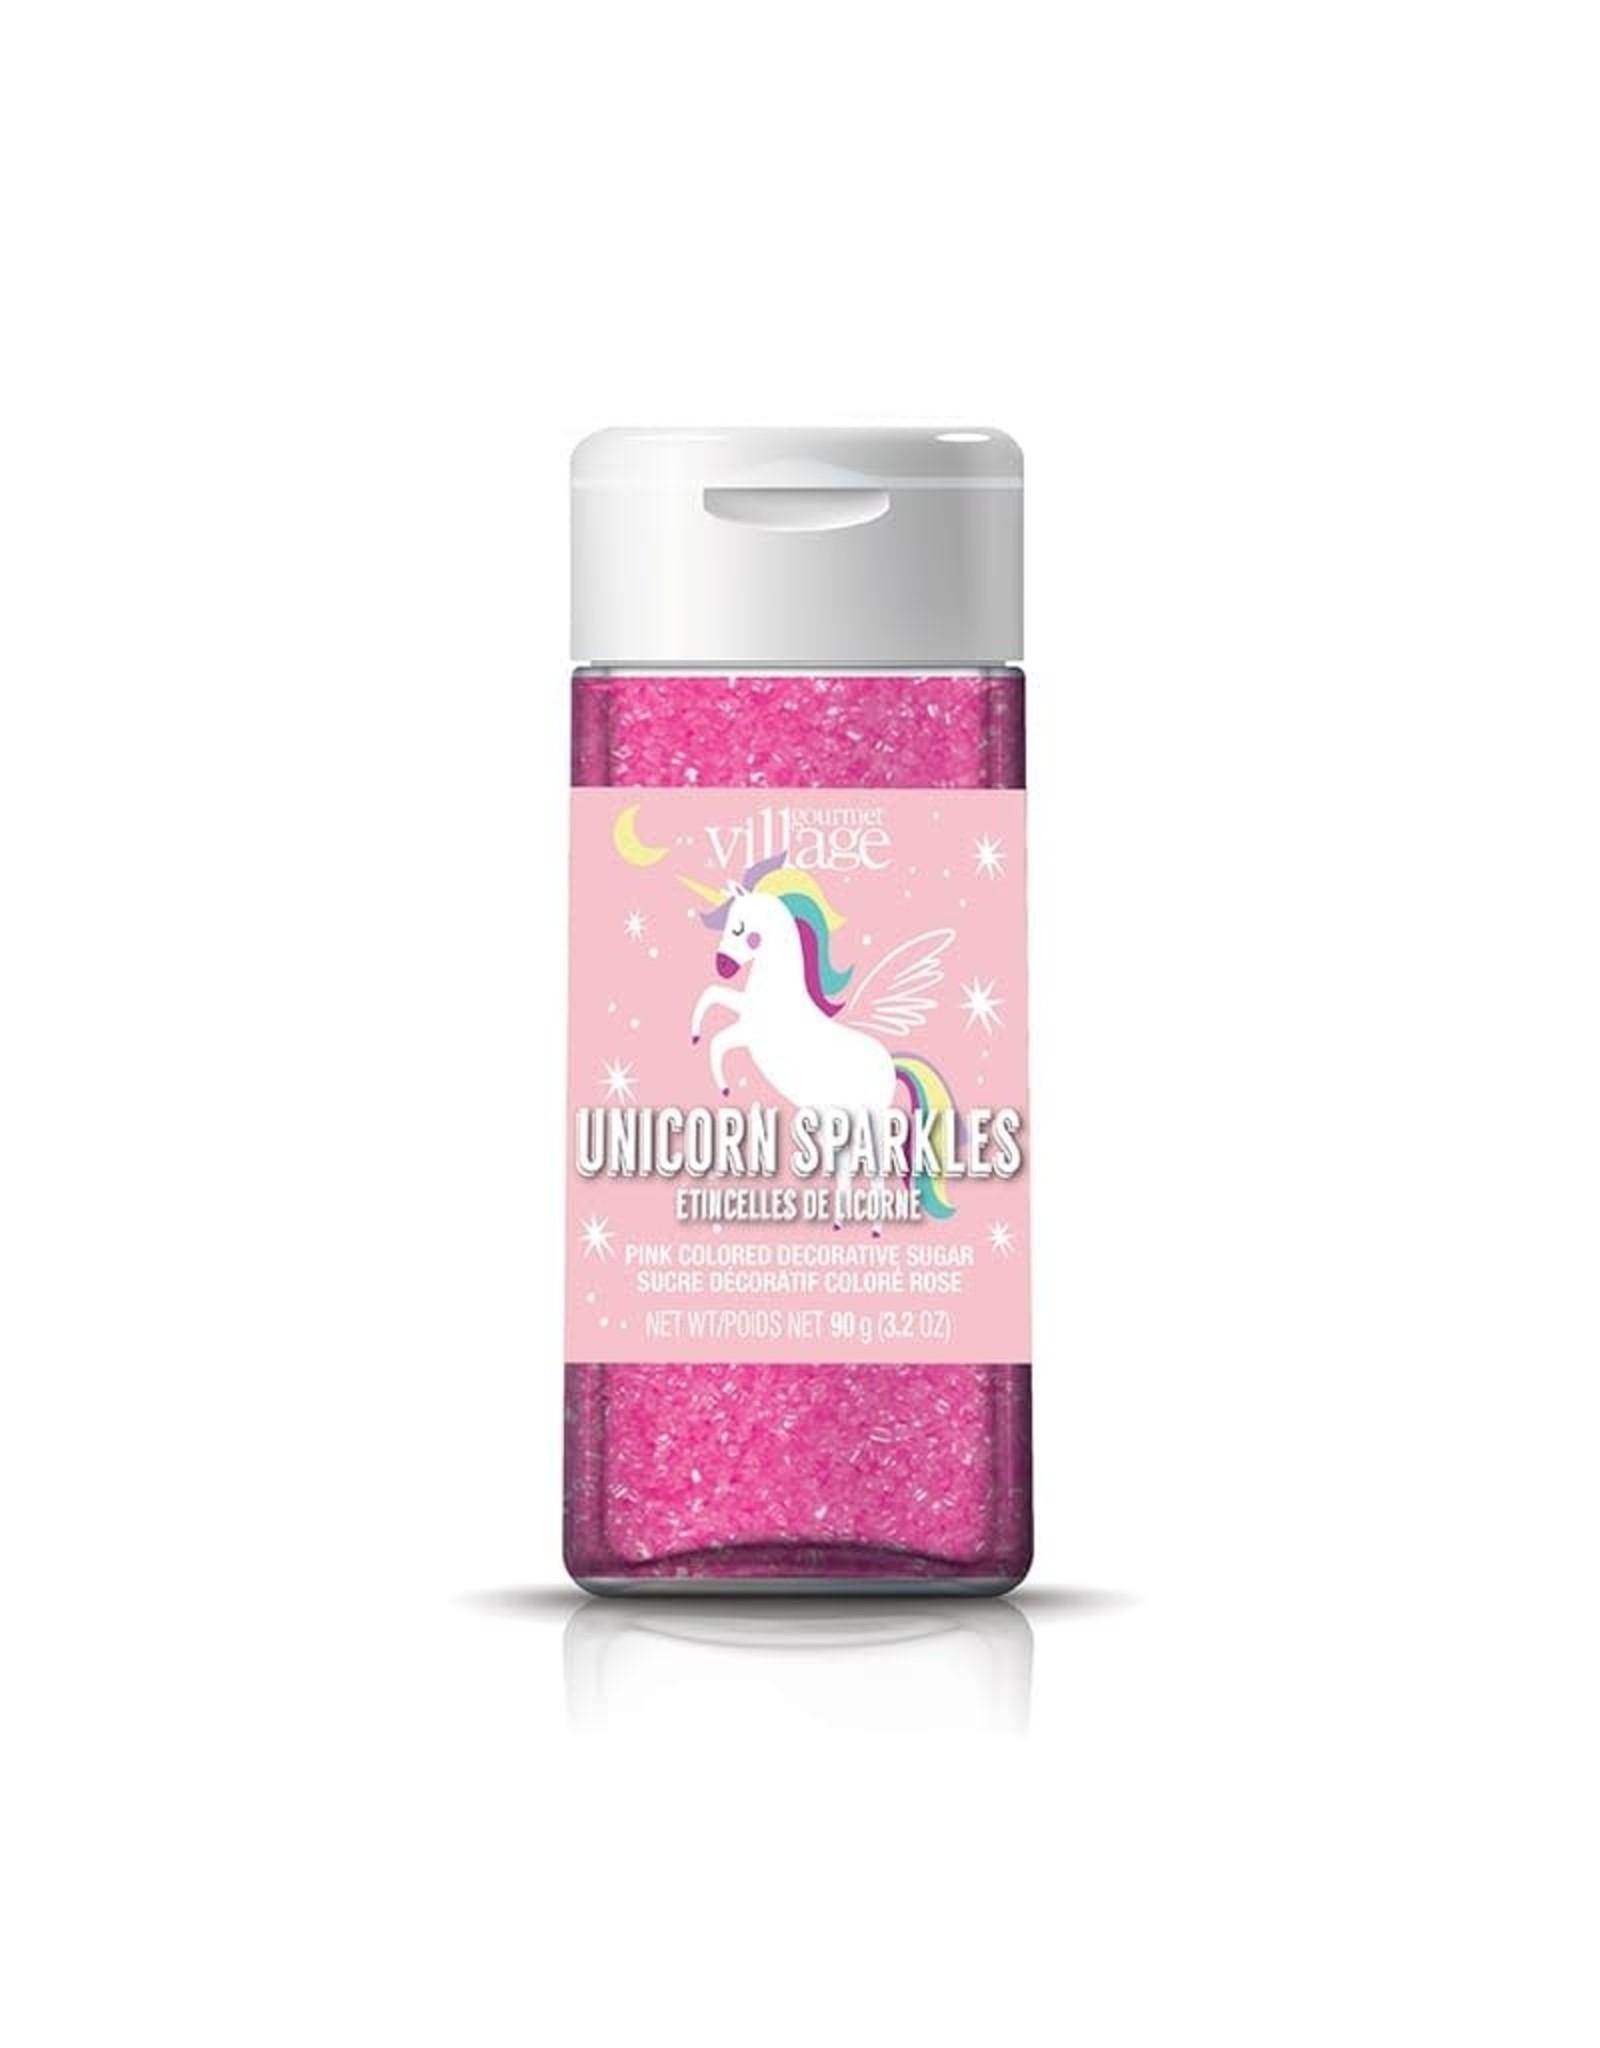 ♥♥ Edible Unicorn Sparkles